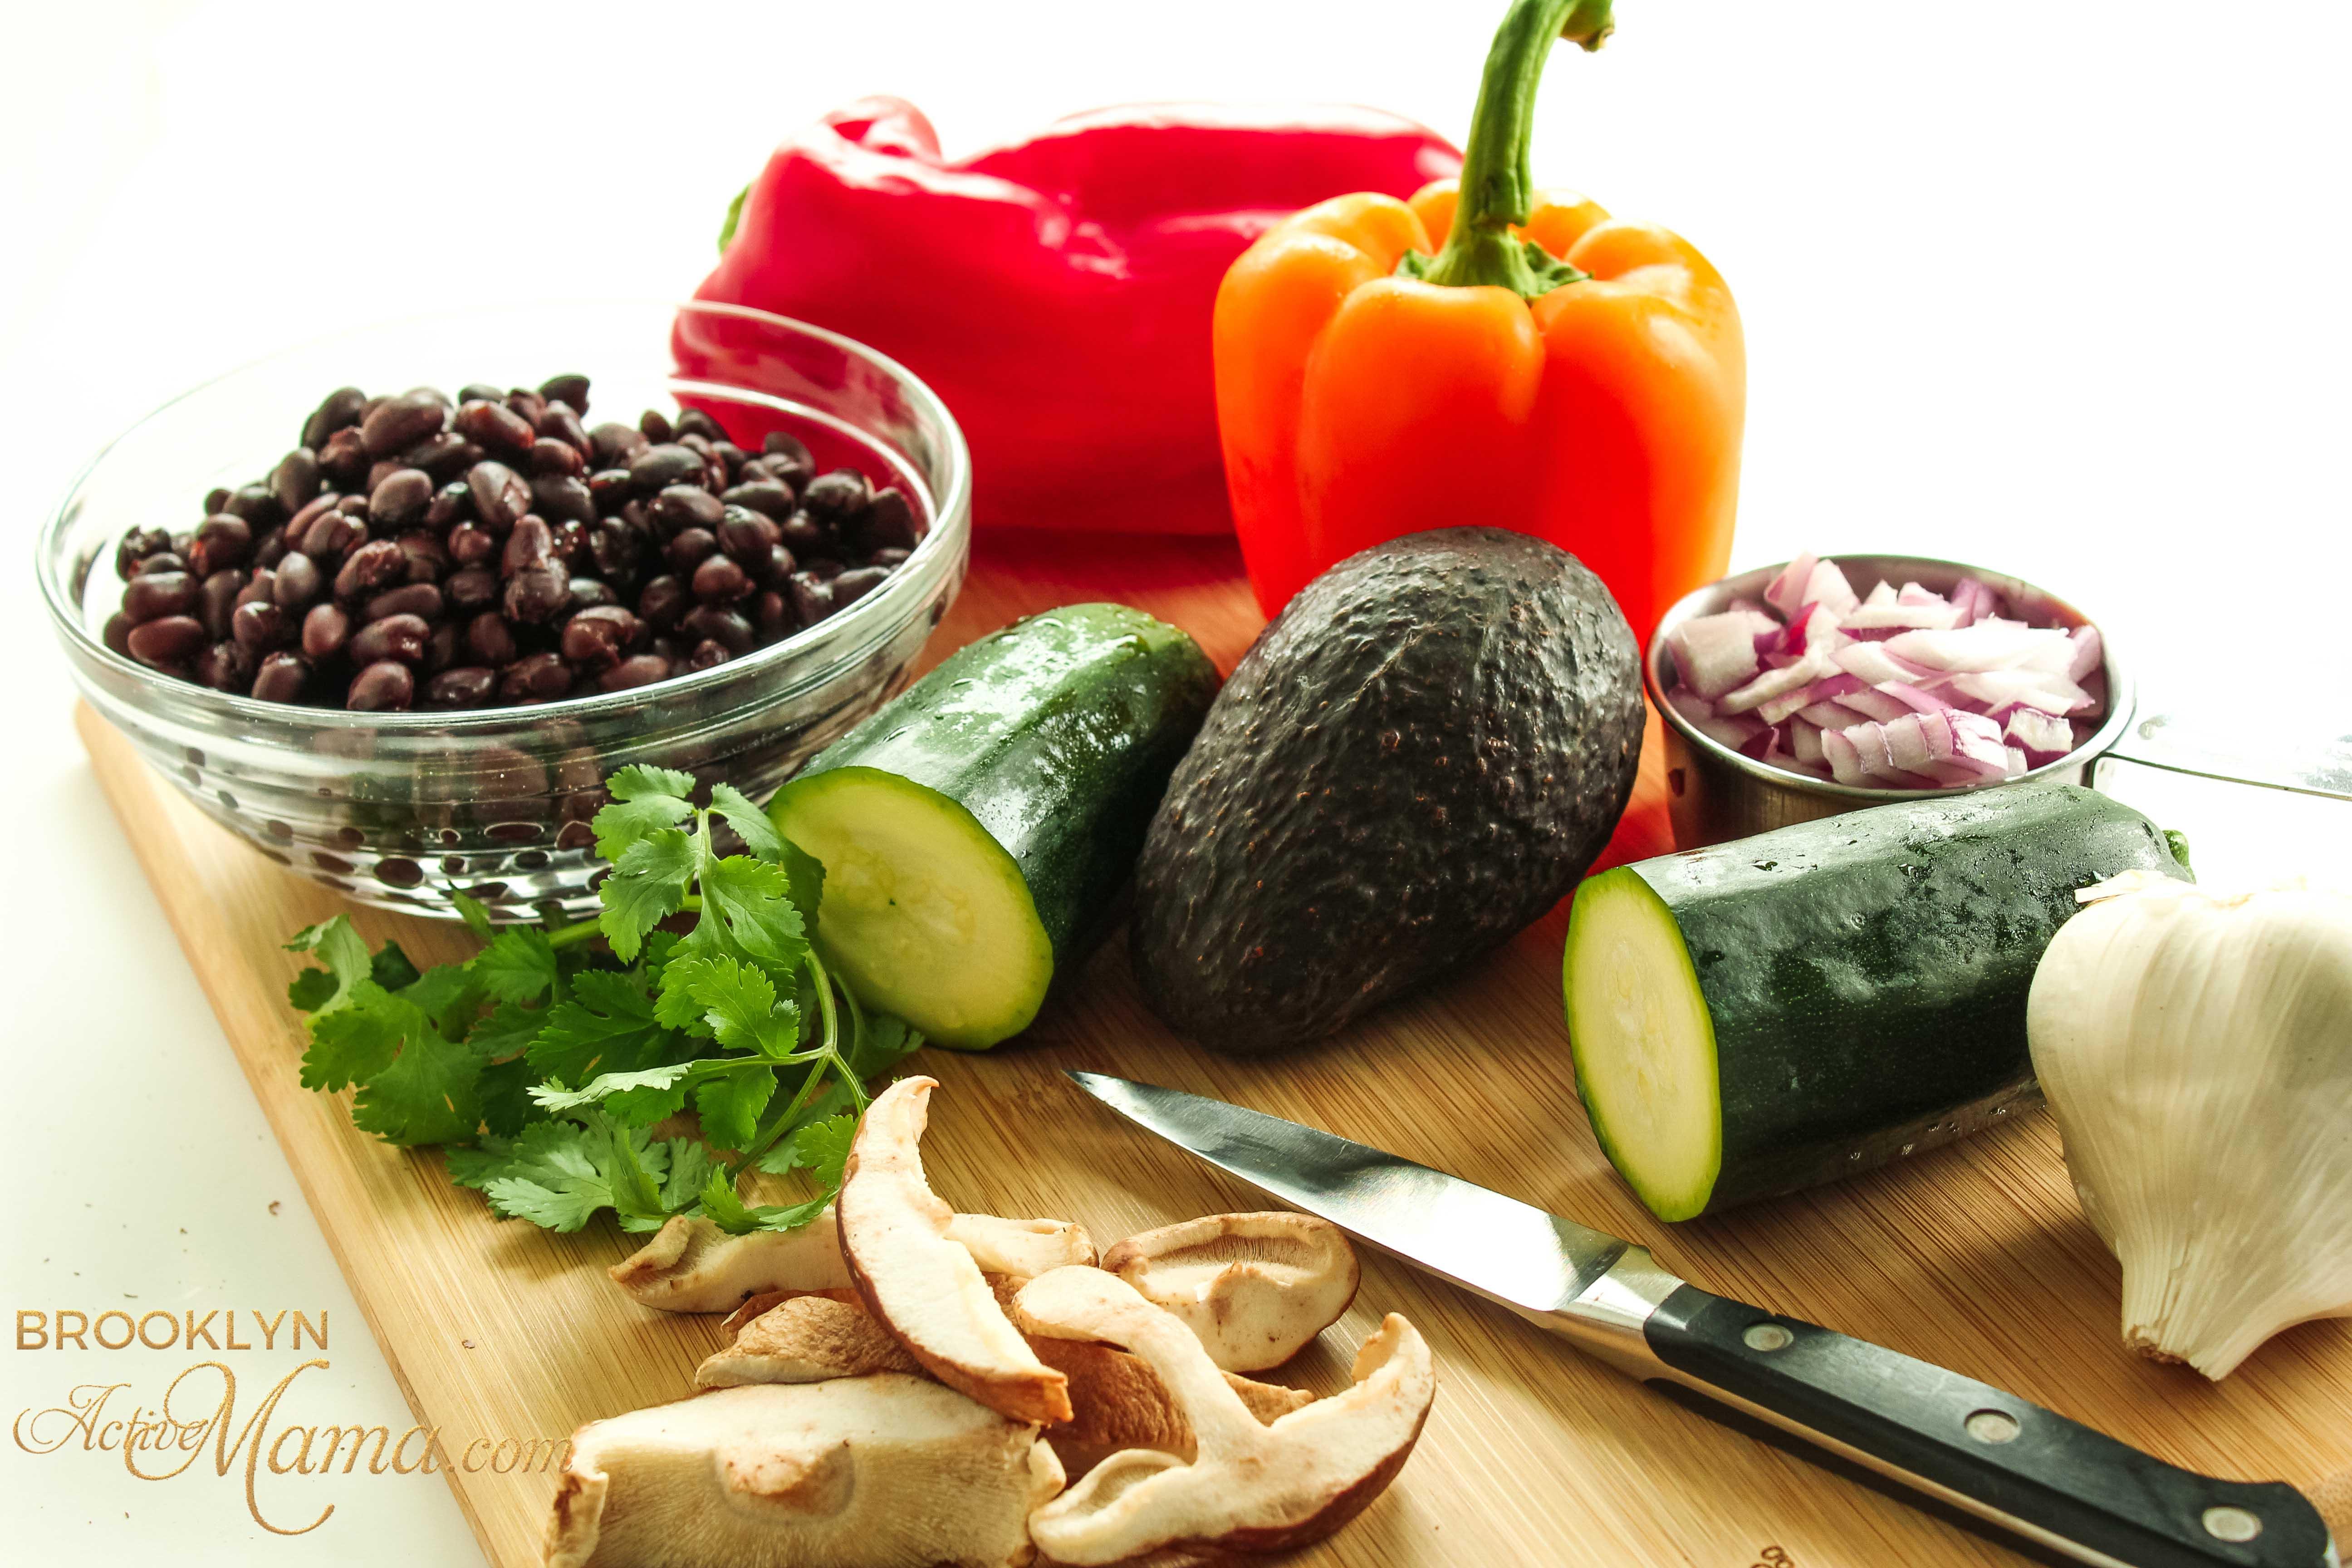 ingredients for veggie tacos